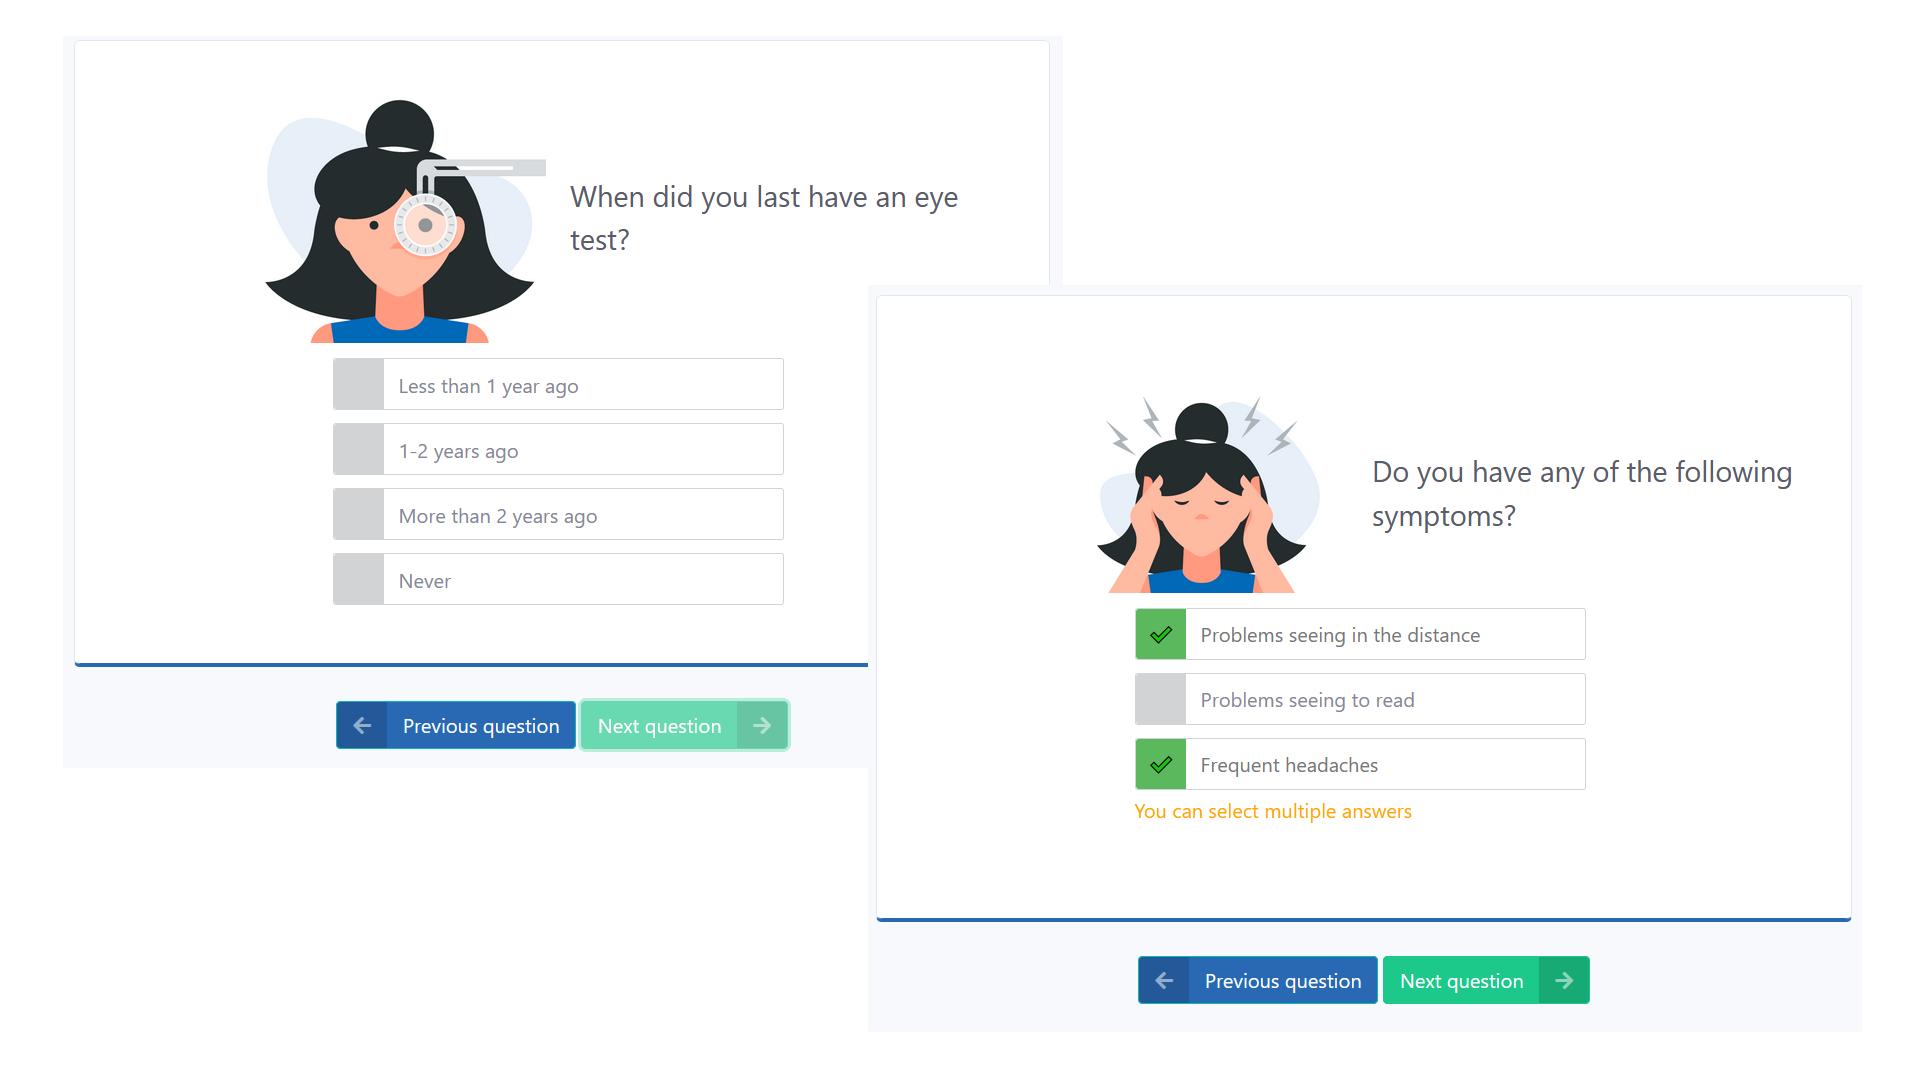 CheckMyVision Questionnaire